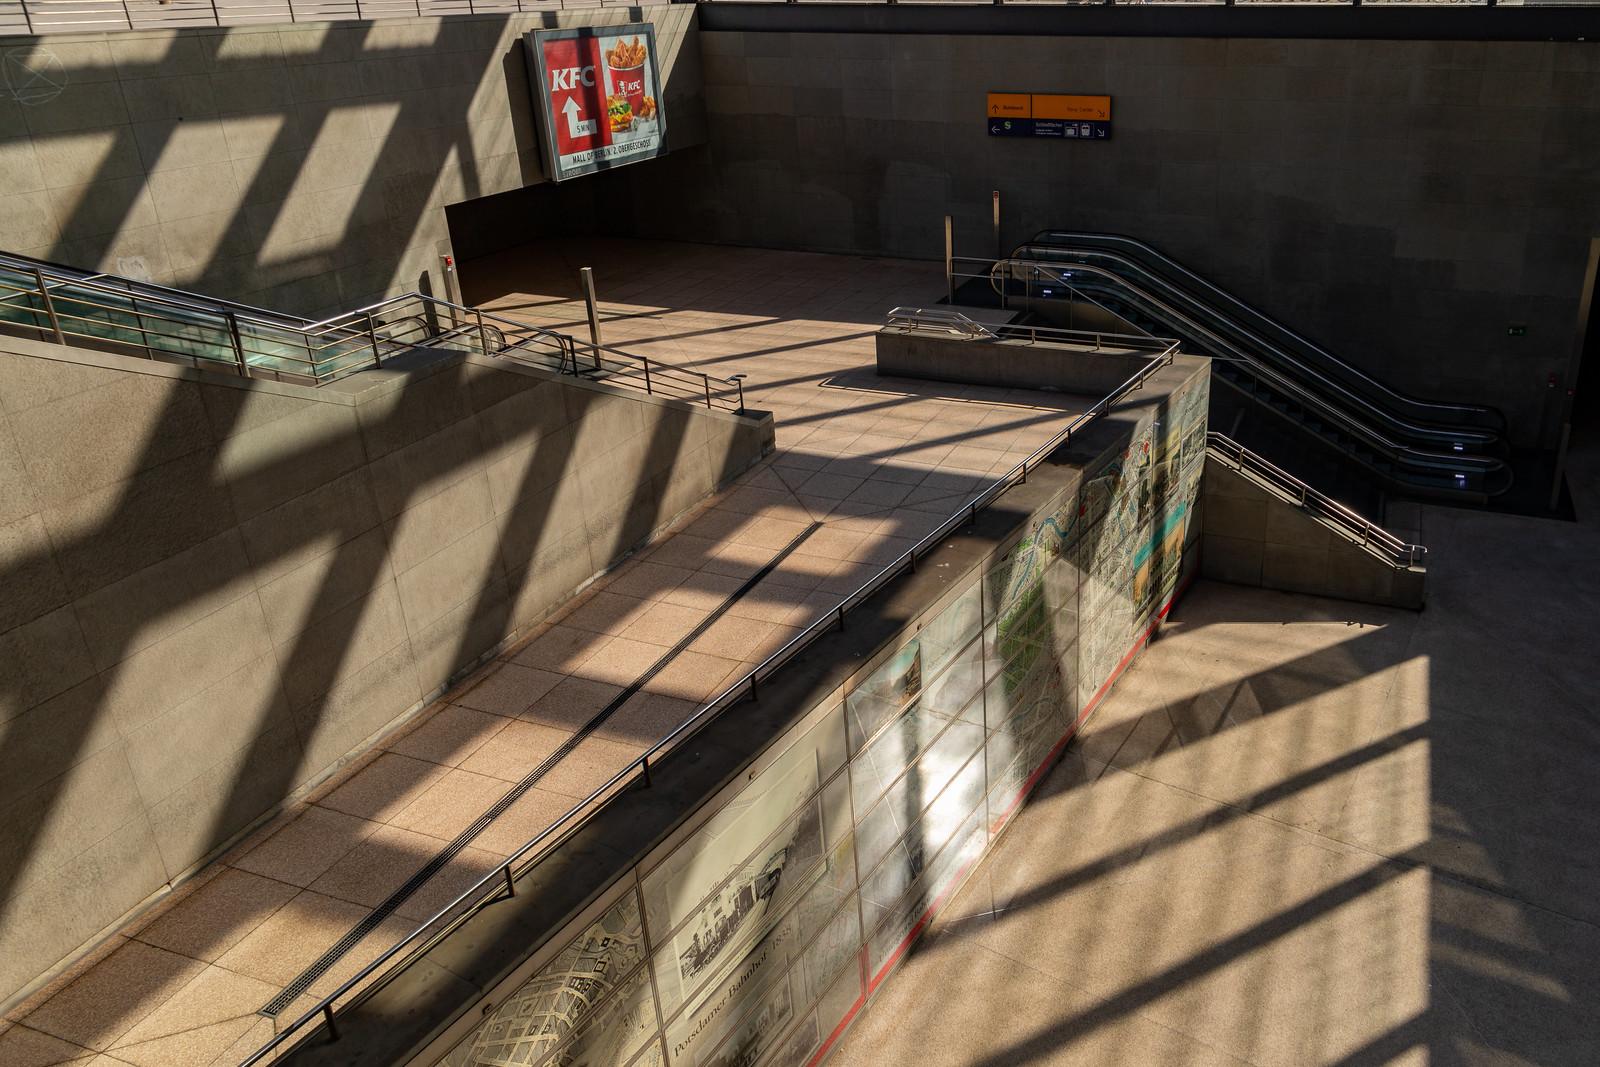 Der Bahnhof Potsdamer Platz